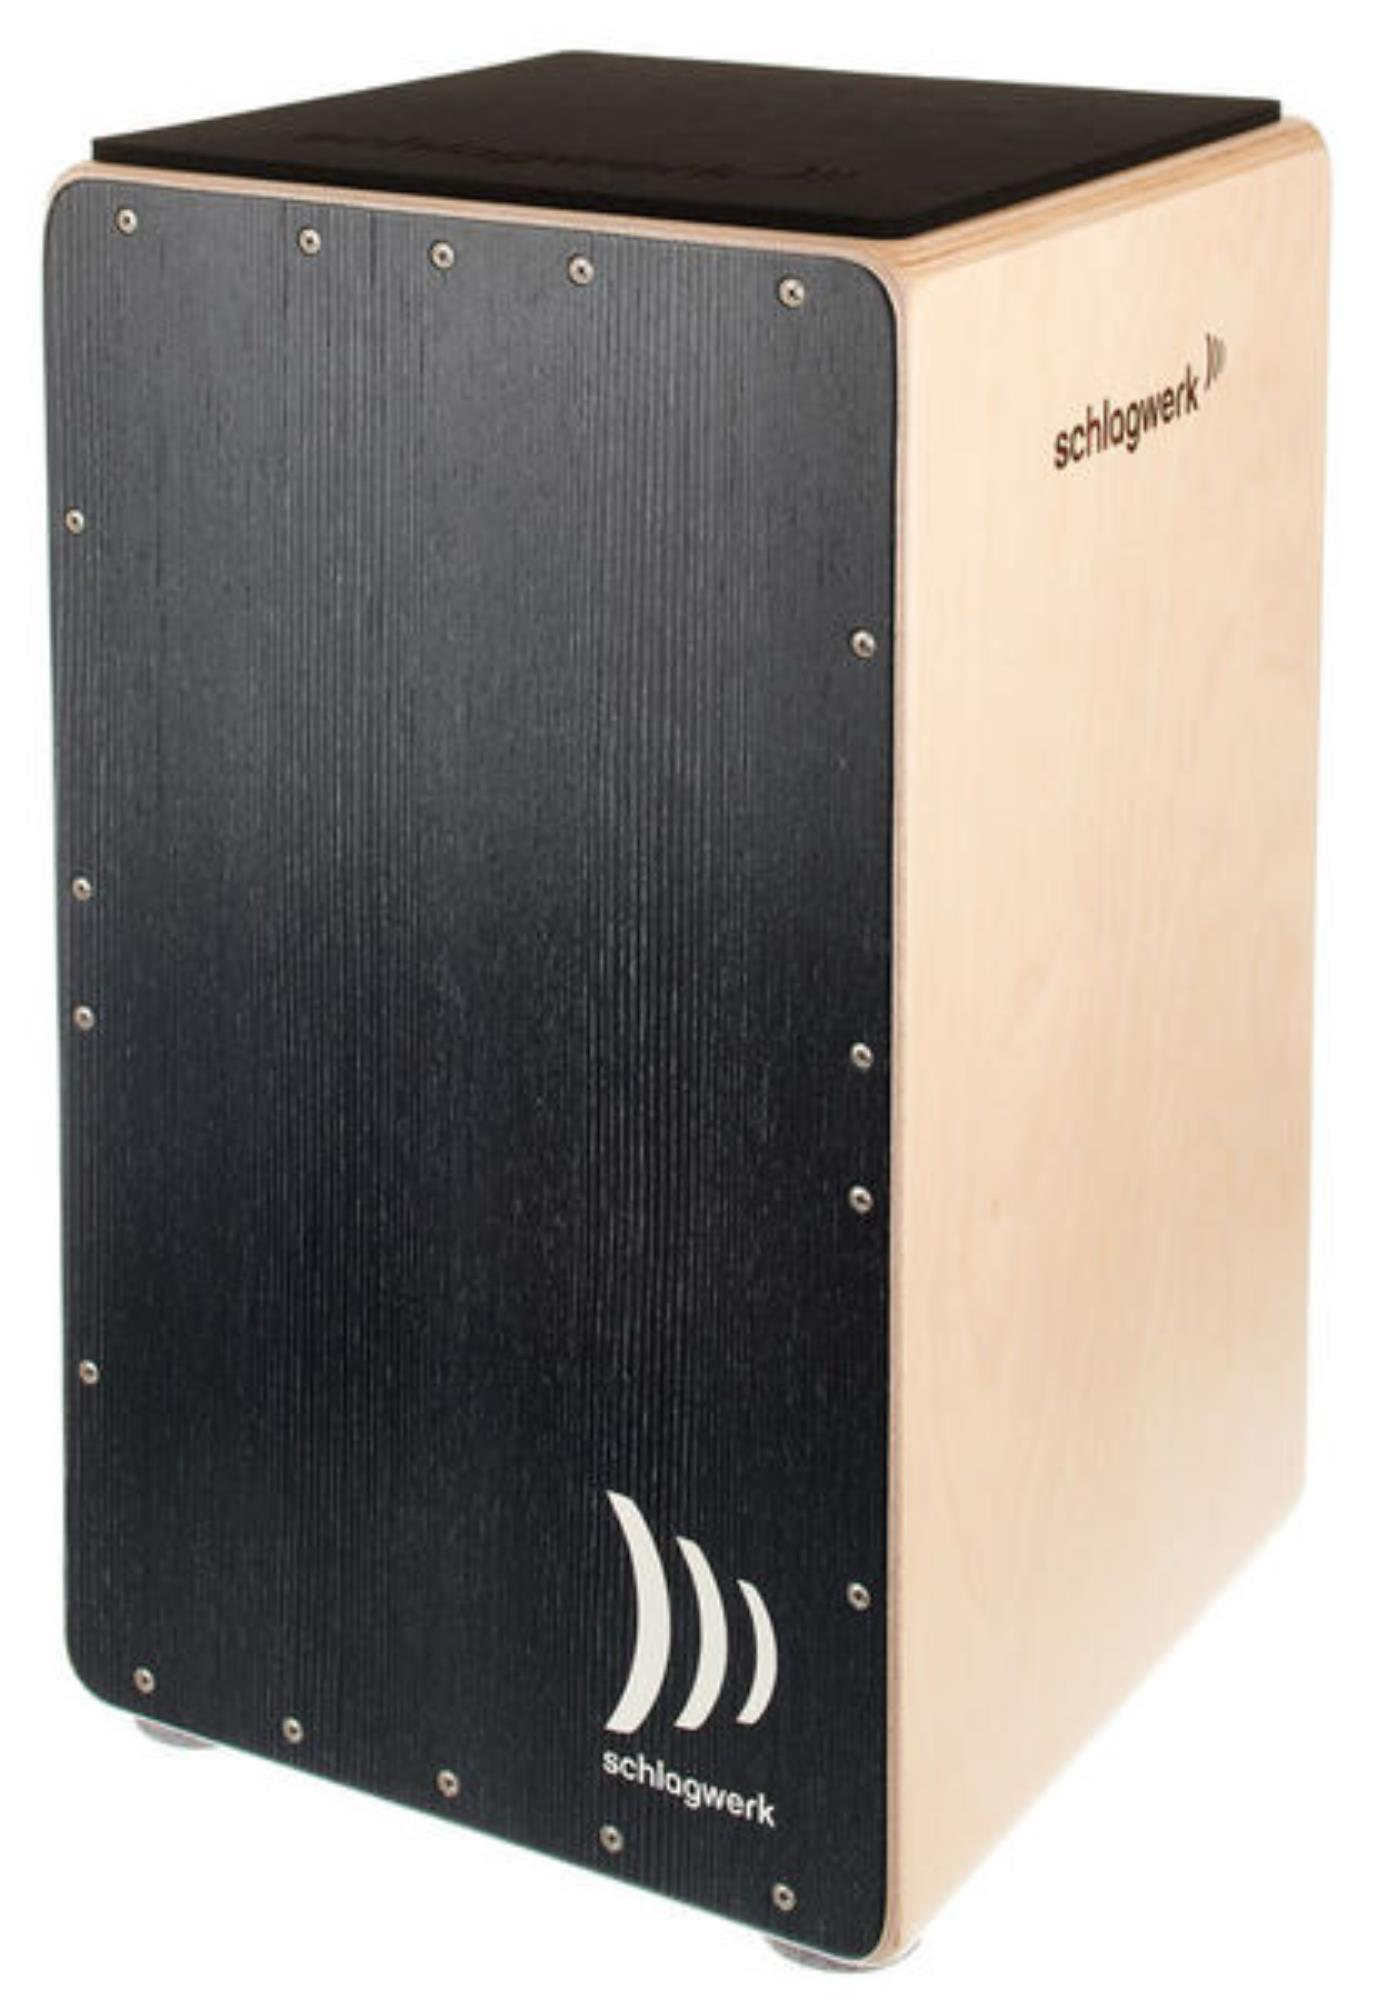 SCHLAGWERK-CP5003-CAJON-PRECISE-OS-BLACK-SILVER-sku-24545